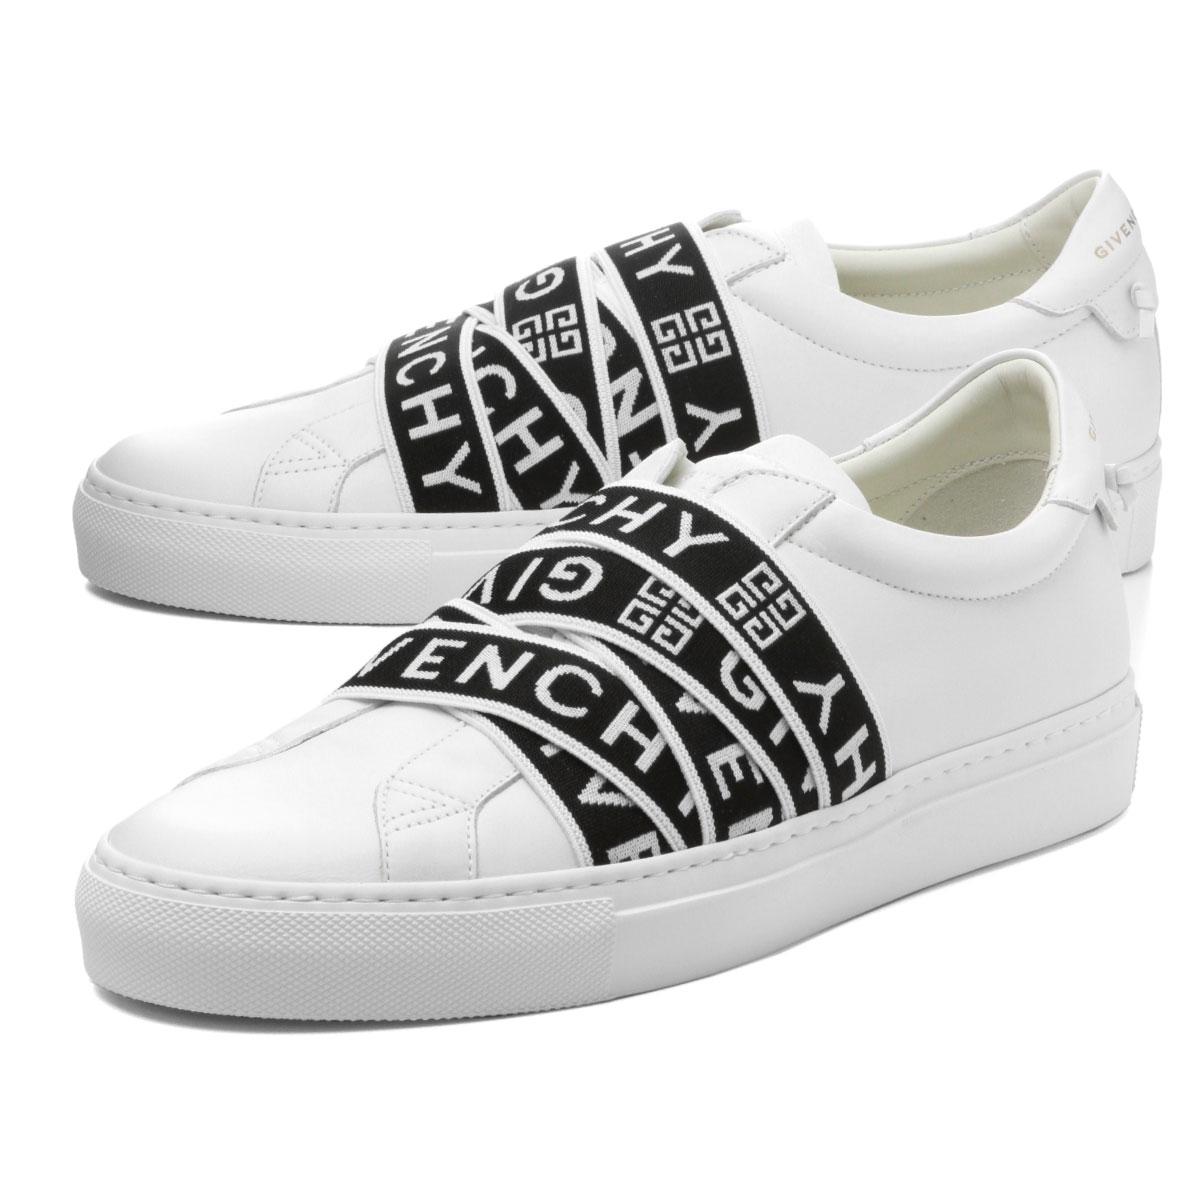 Givenchy GIVENCHY shoes men BH001SH0CZ 116 sneakers URBAN STREET Urban street WHITEBLACK white